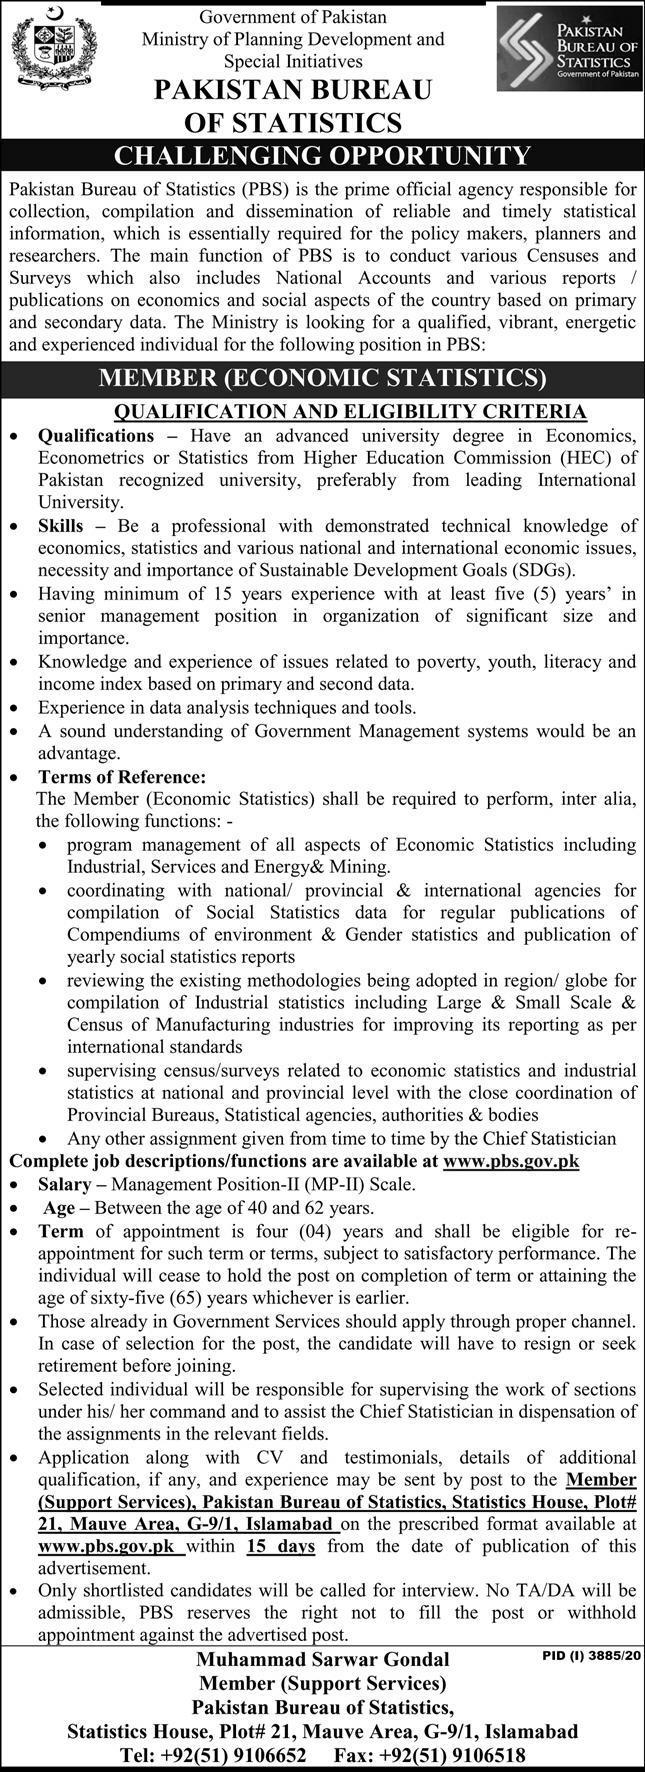 Member (Ecnomics Statistics) Jobs in Pakistan Bureau of Statistics 26 Jan 2021